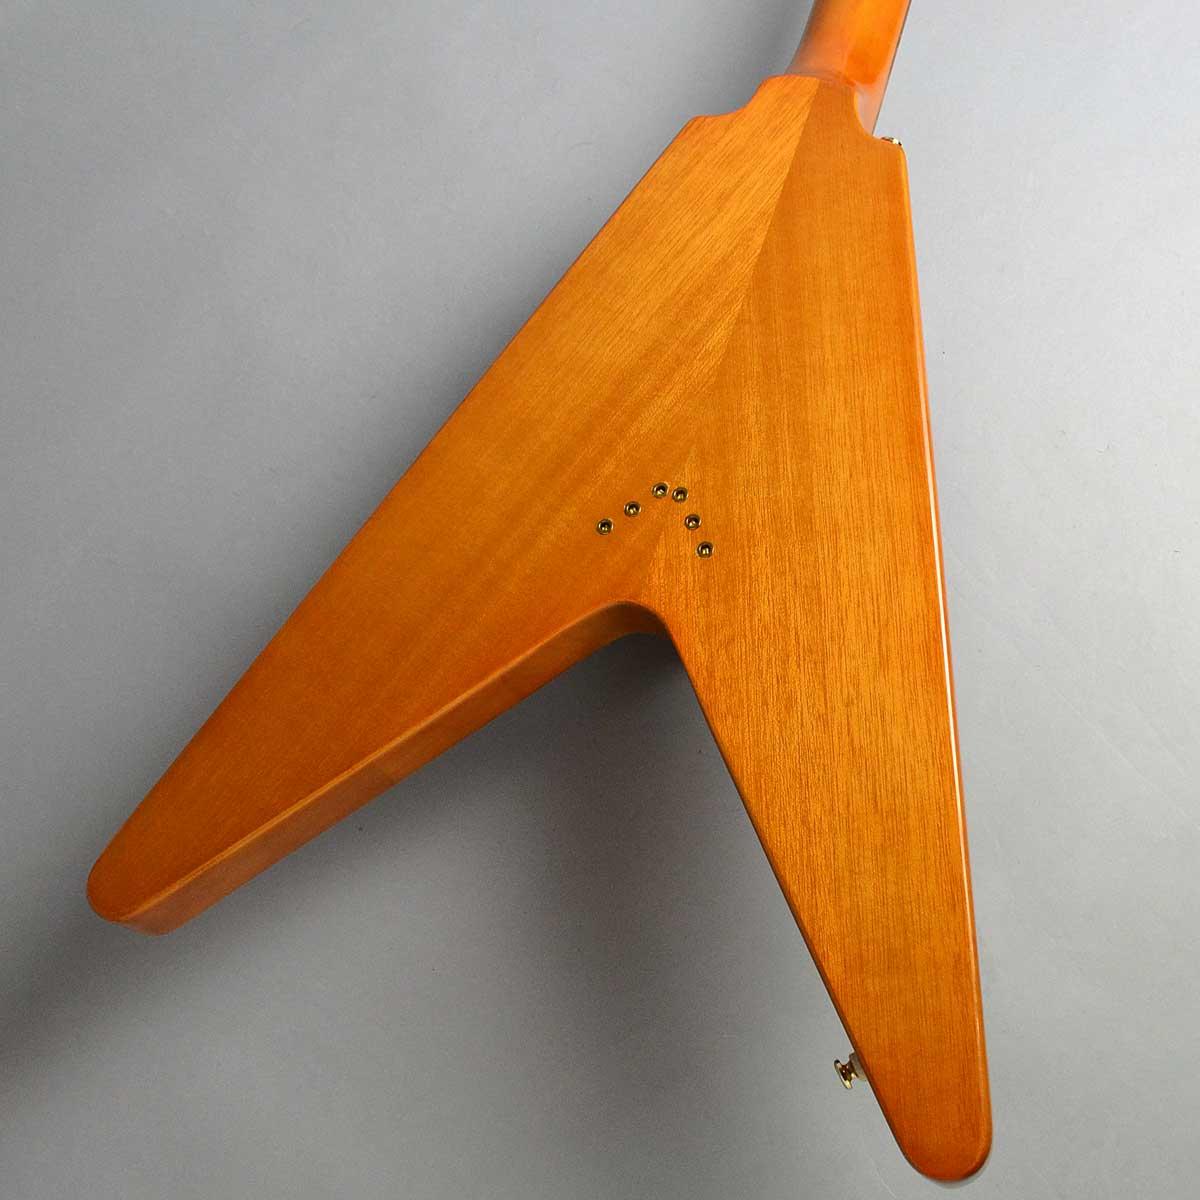 Limited Edition 1958 Korina Flying-Vのボディバック-アップ画像